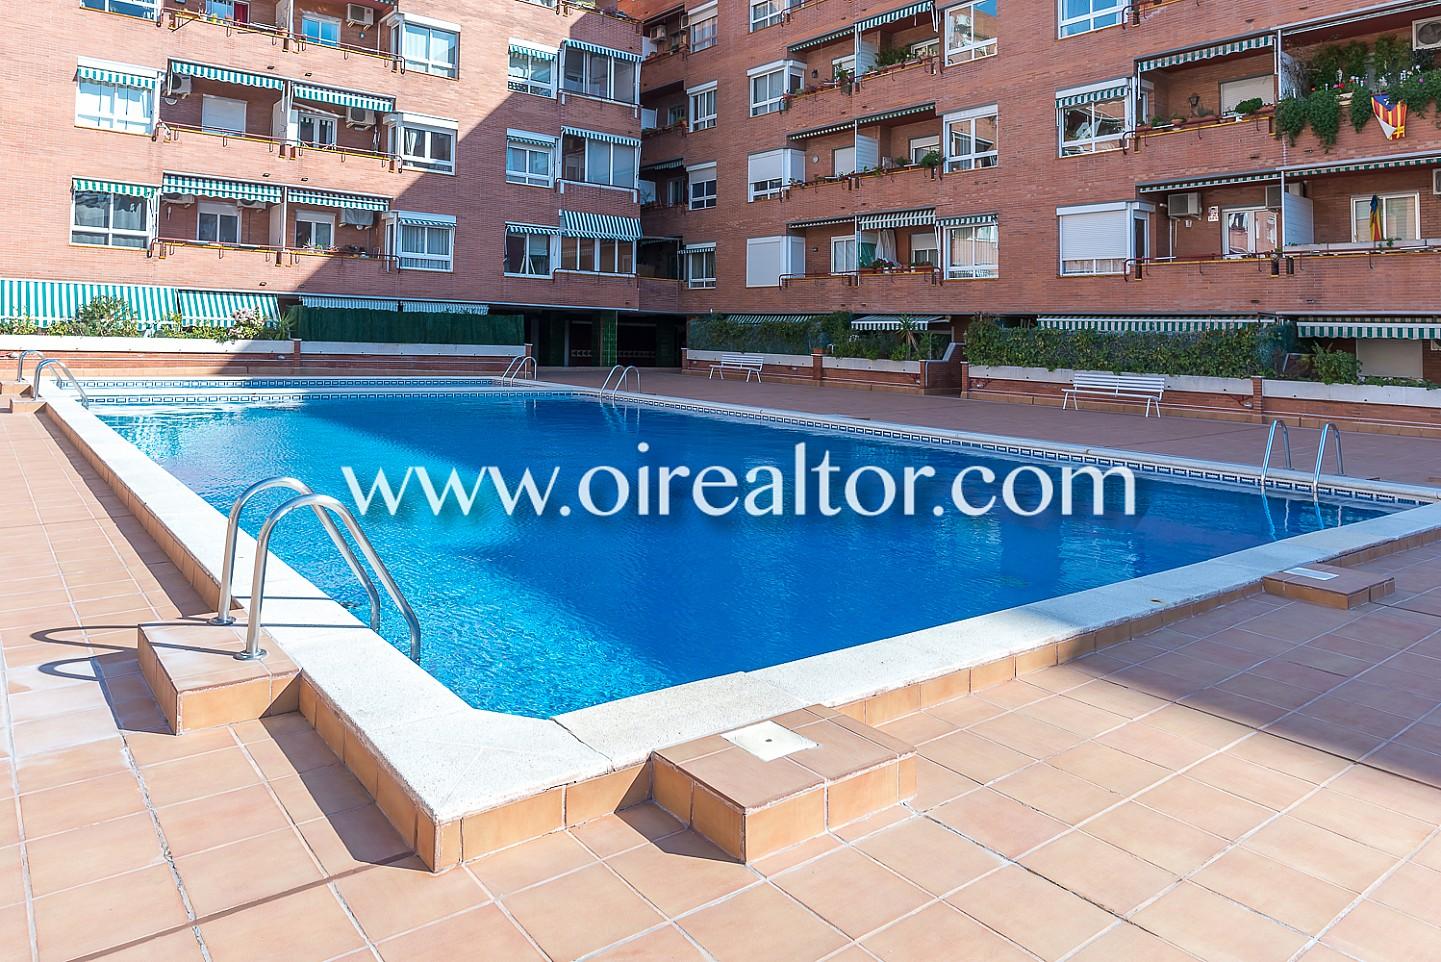 Acogedor tico en venta con terraza y piscina muy cerca de plaza espa a barcelona oi realtor - Piscina terraza atico ...